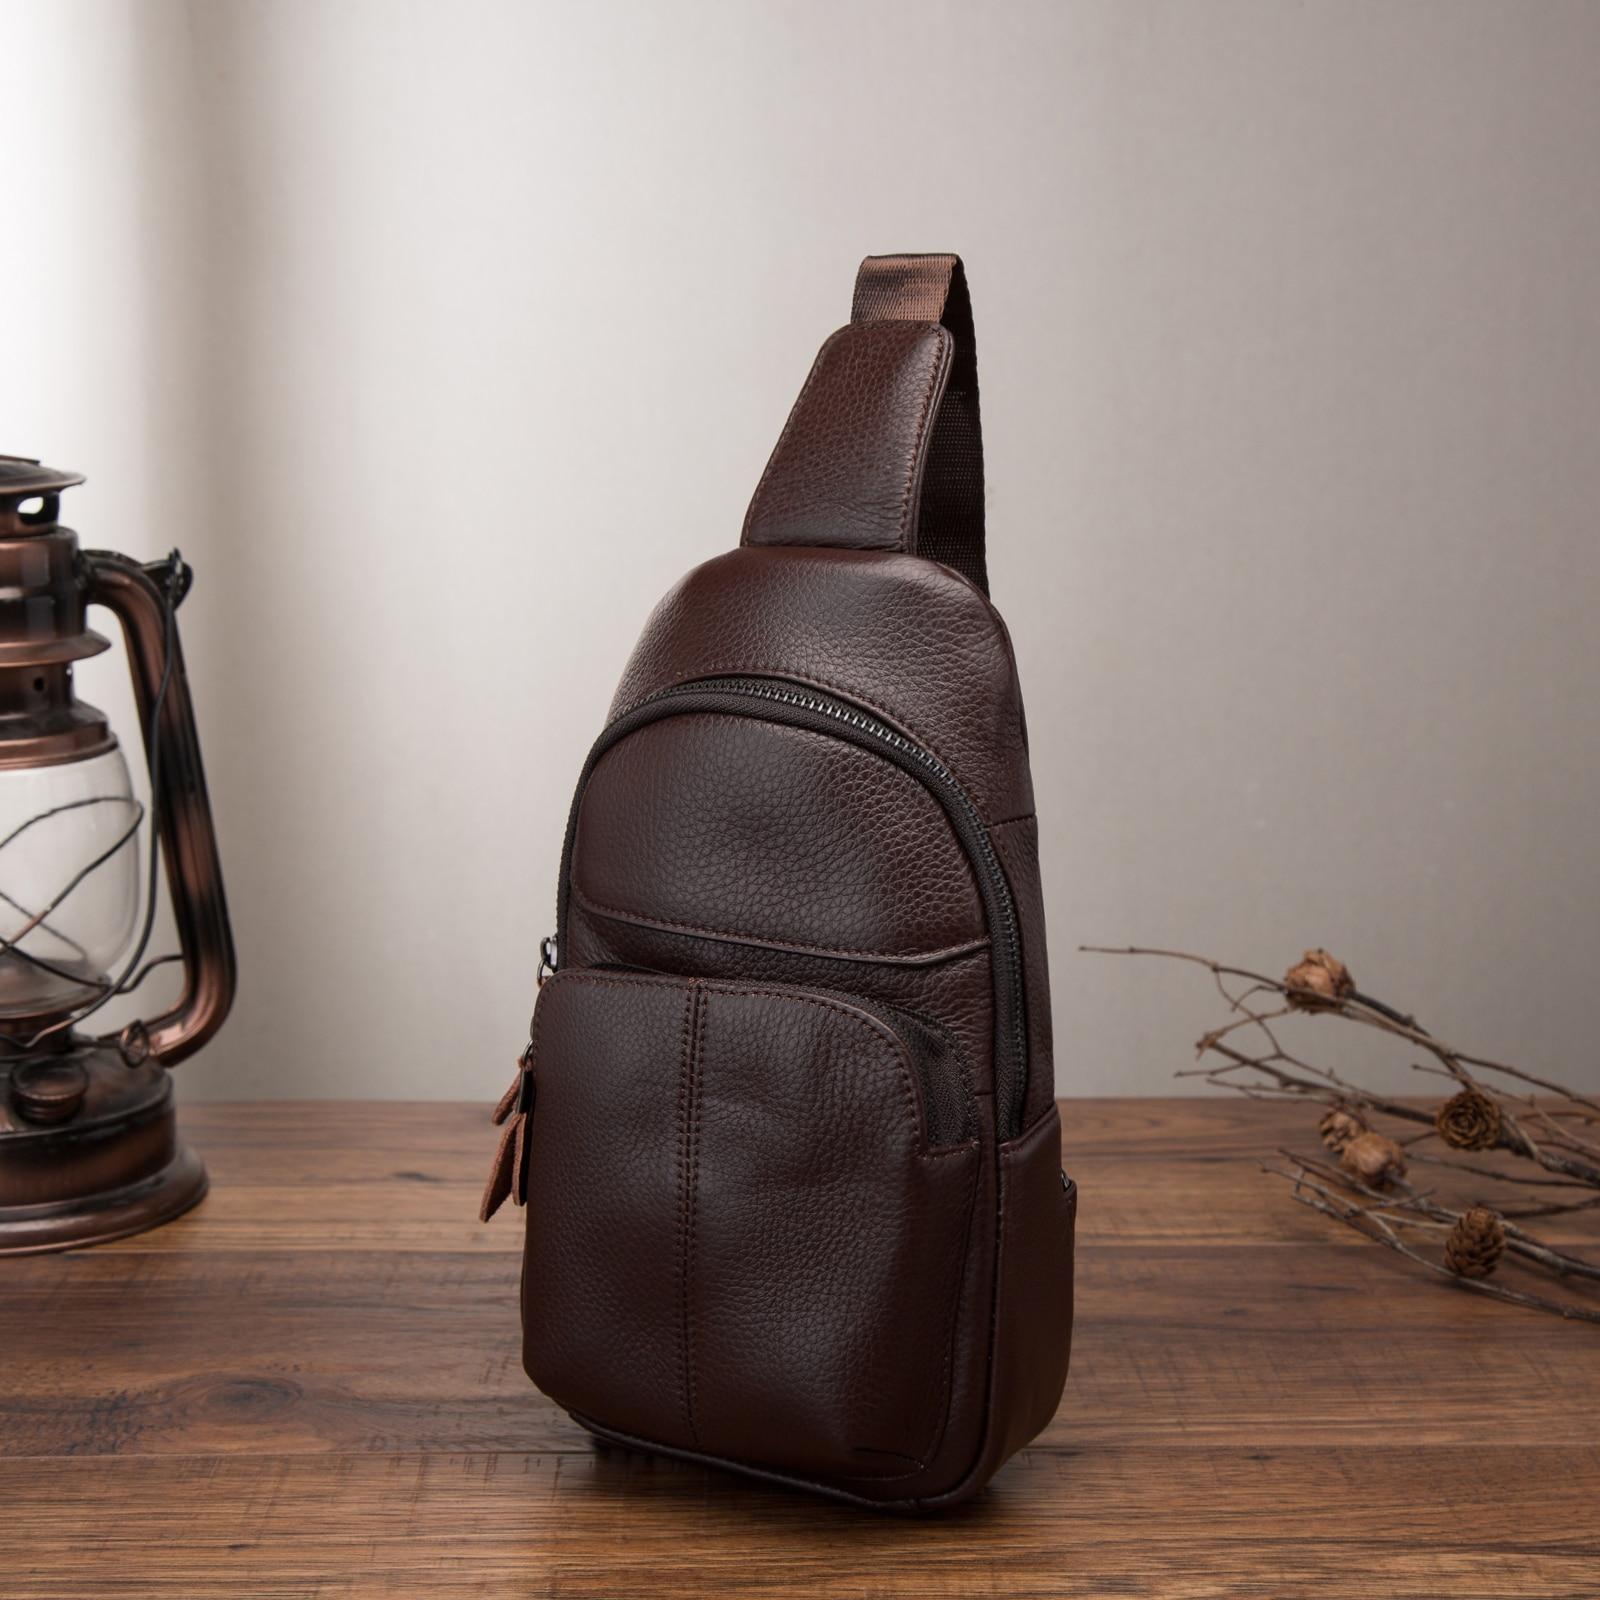 The 8135 Black Leaokuu Mens Genuine Leather Running Sport Waist Hip Bum Pack Drop Chest Bag Pouch